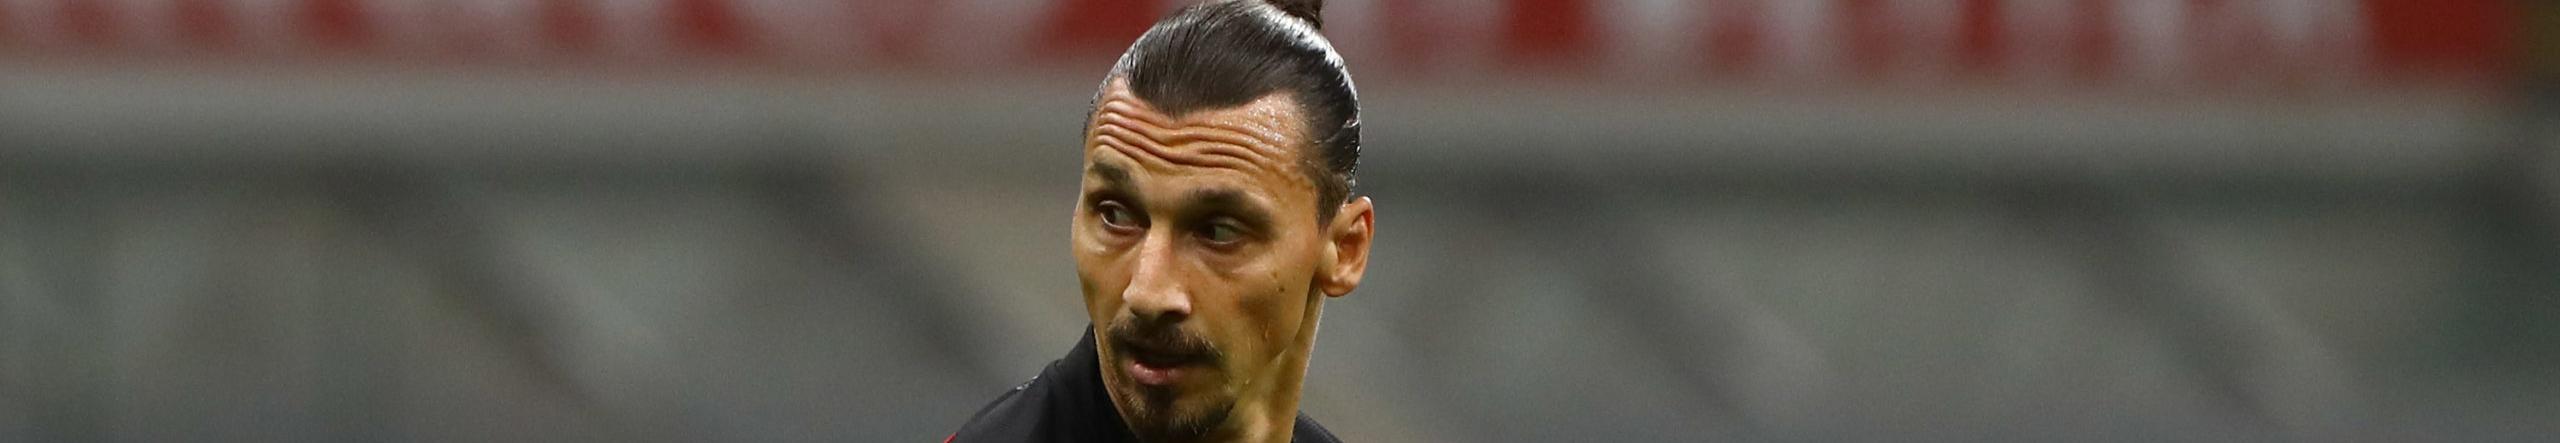 Shamrock-Milan: parte l'assalto rossonero all'Europa League